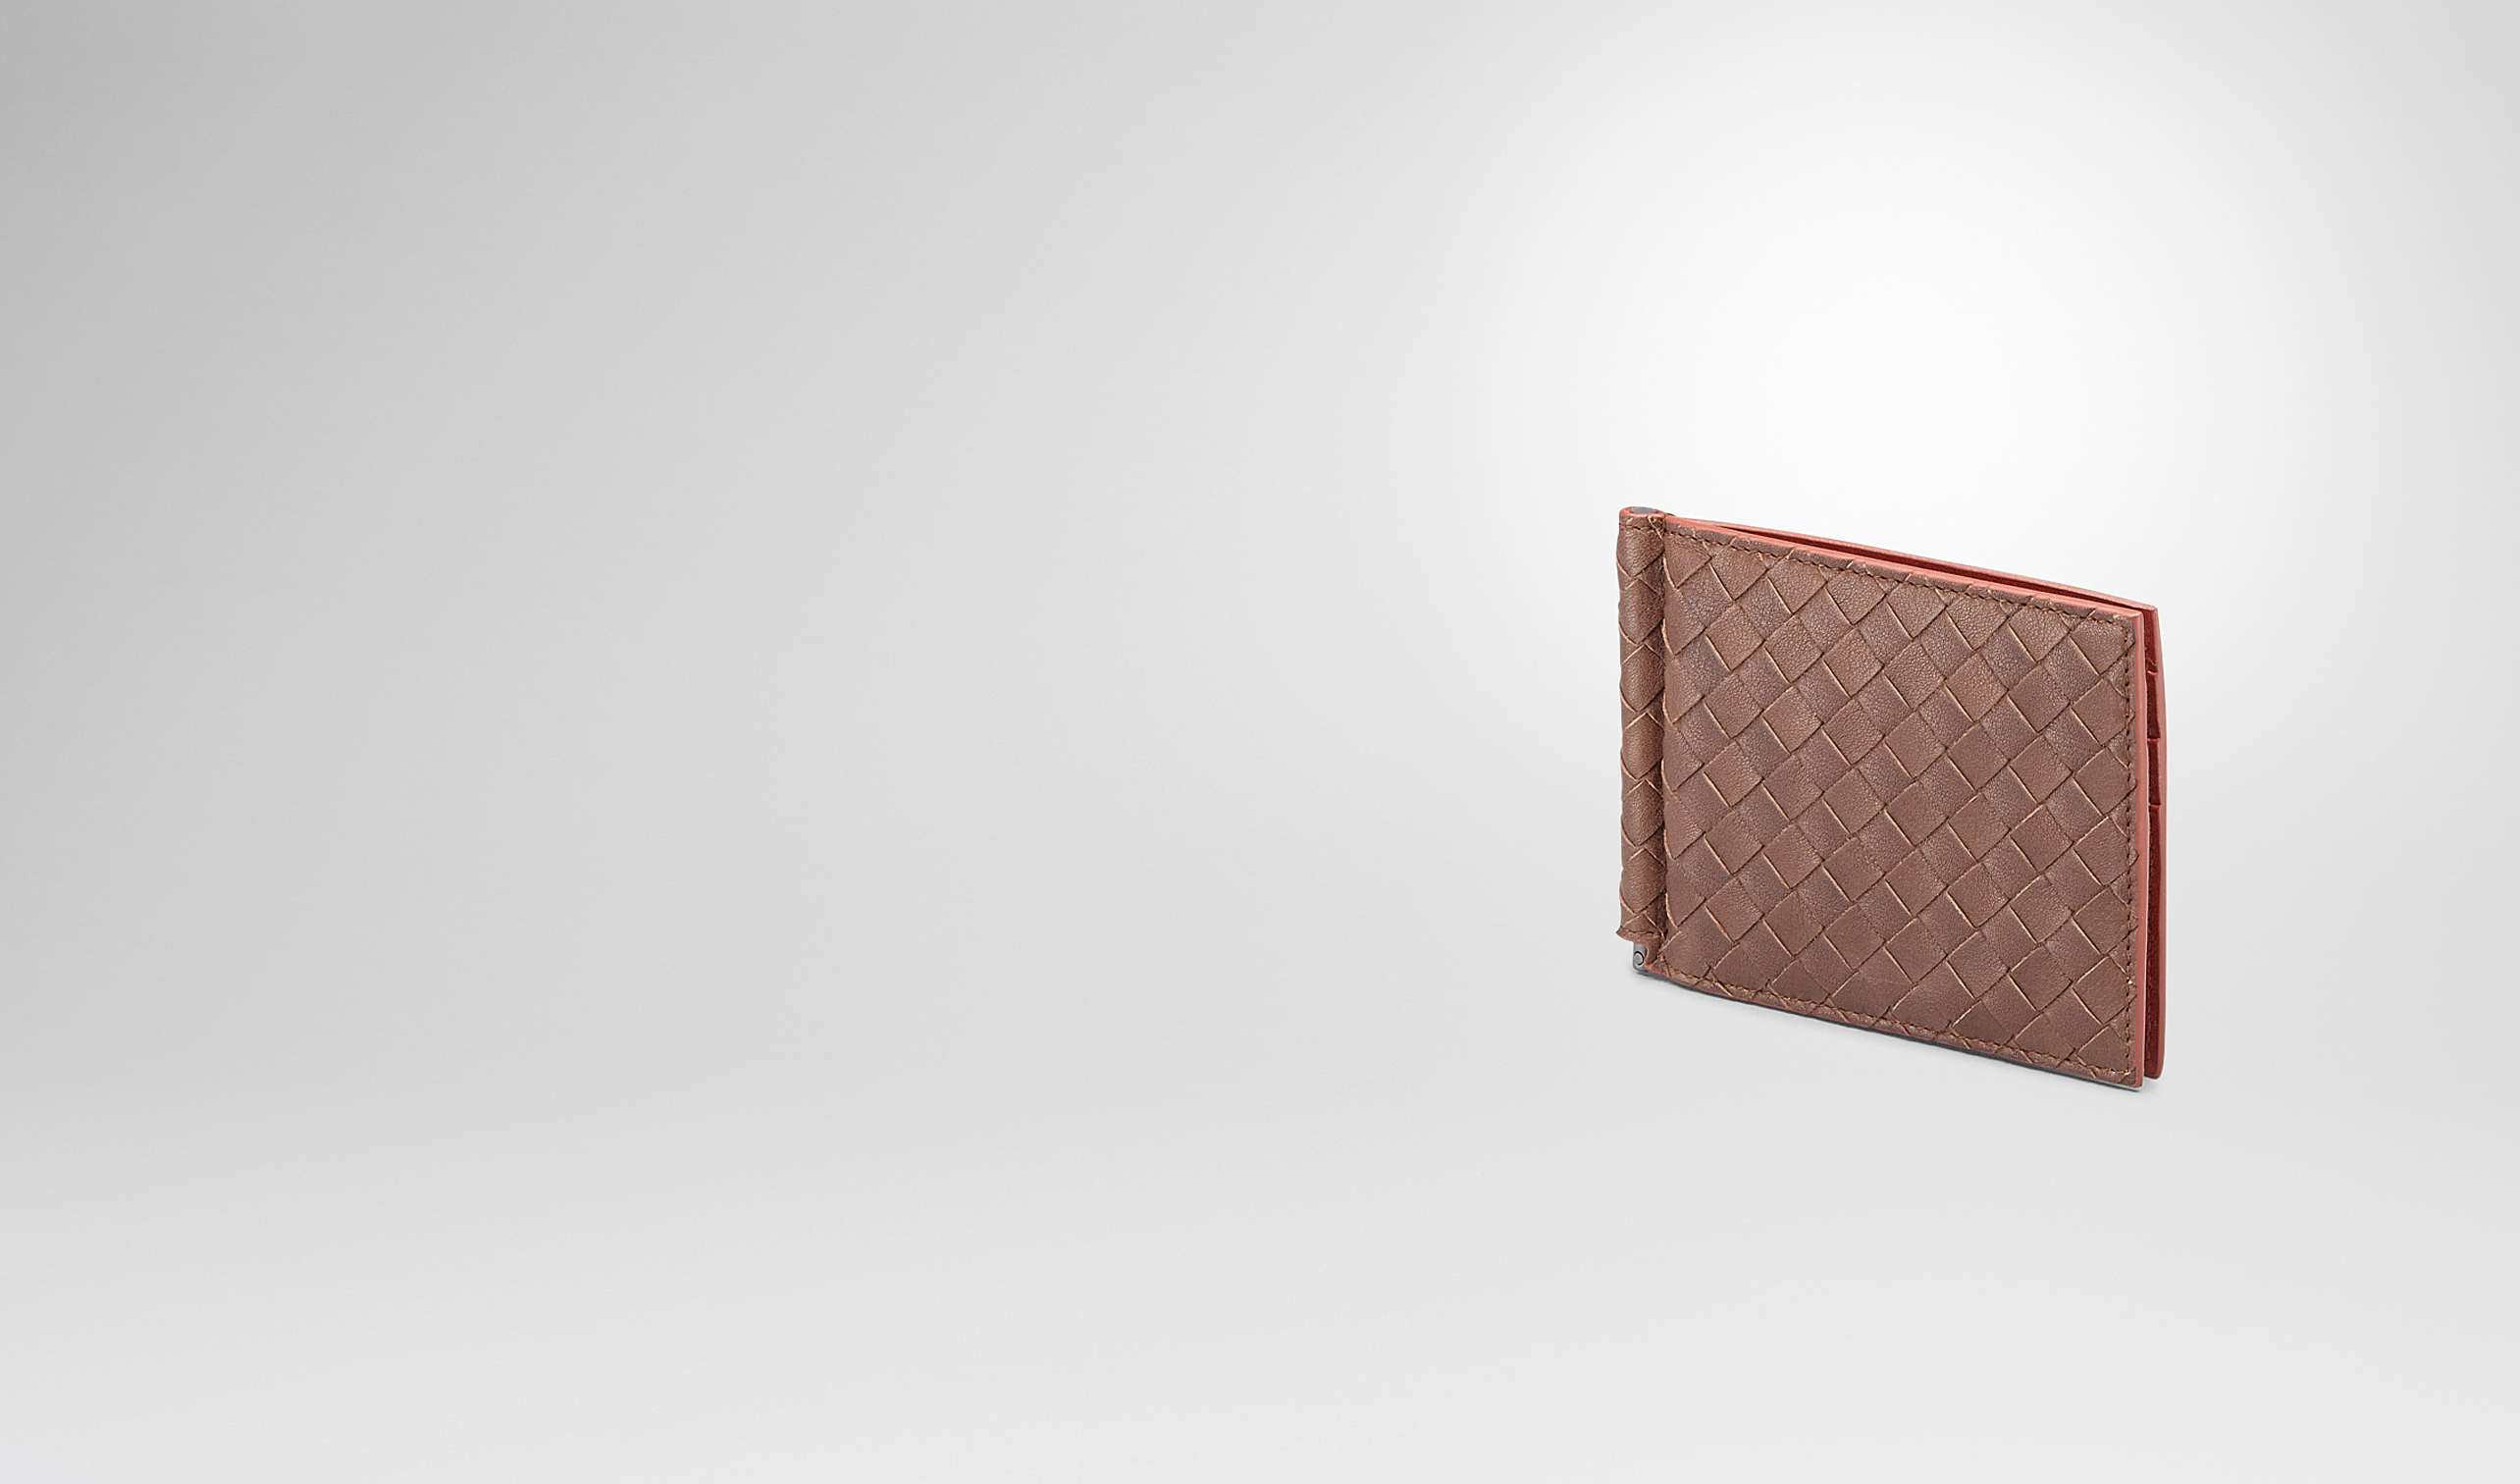 BOTTEGA VENETA Faltbares Portemonnaie U PORTEMONNAIE AUS GEWASCHENEM VINTAGE INTRECCIATO EDOARDO UND BURNT RED pl